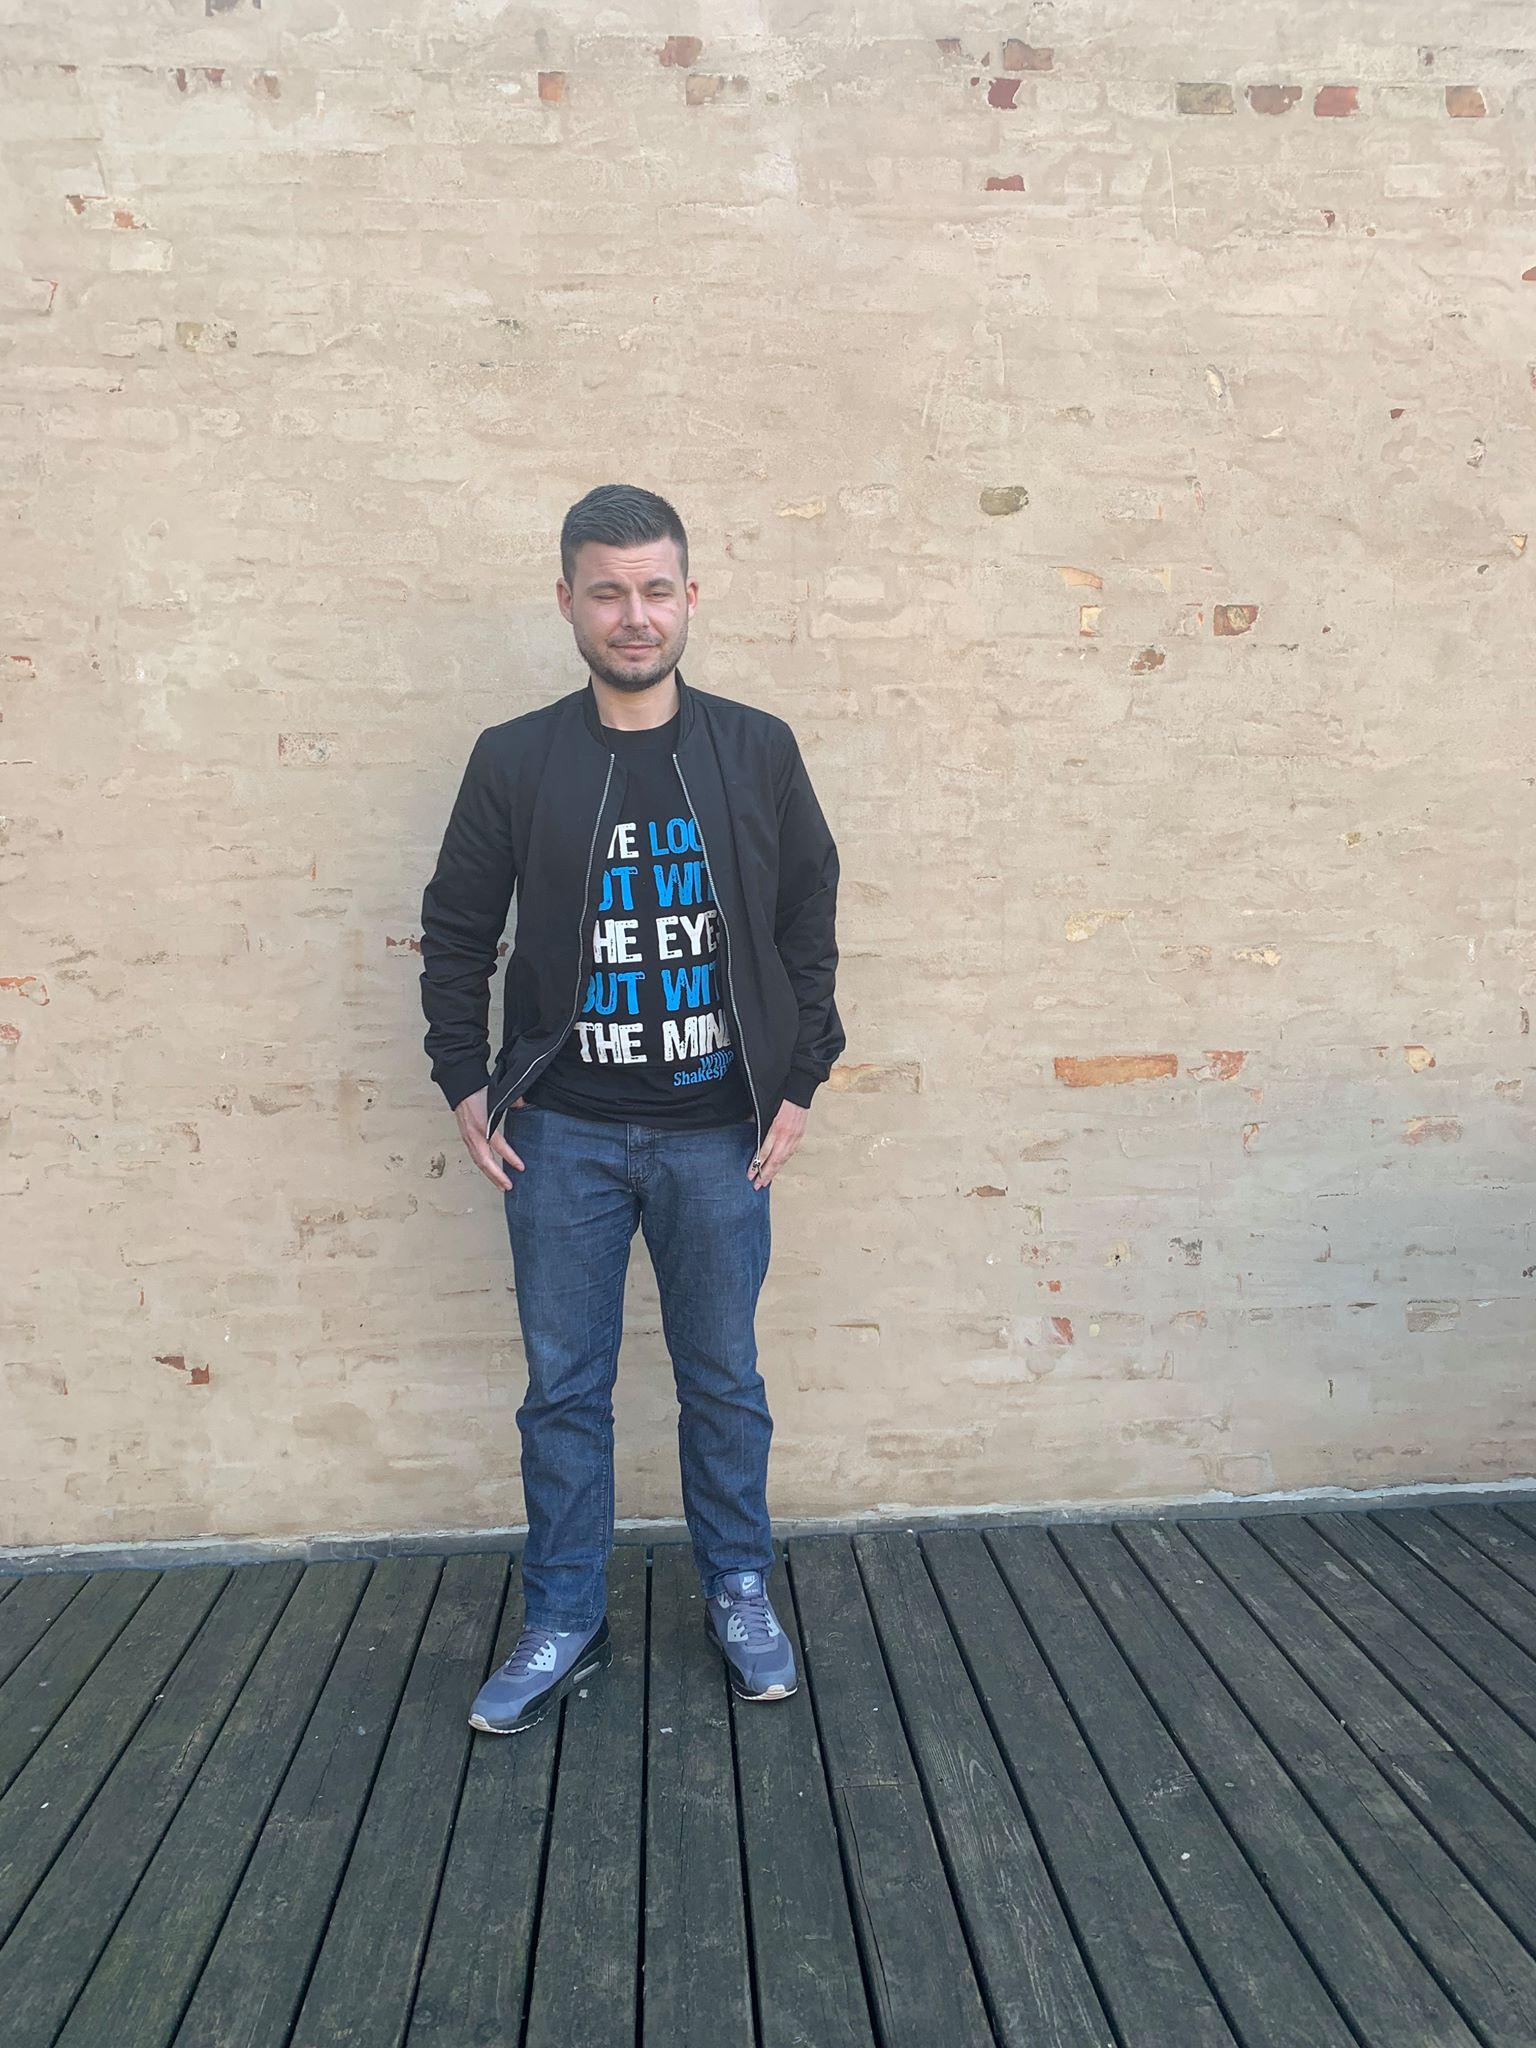 Ôzcan Ajrulovsk Forfatter (digter) Danmark_ Tyrkiet